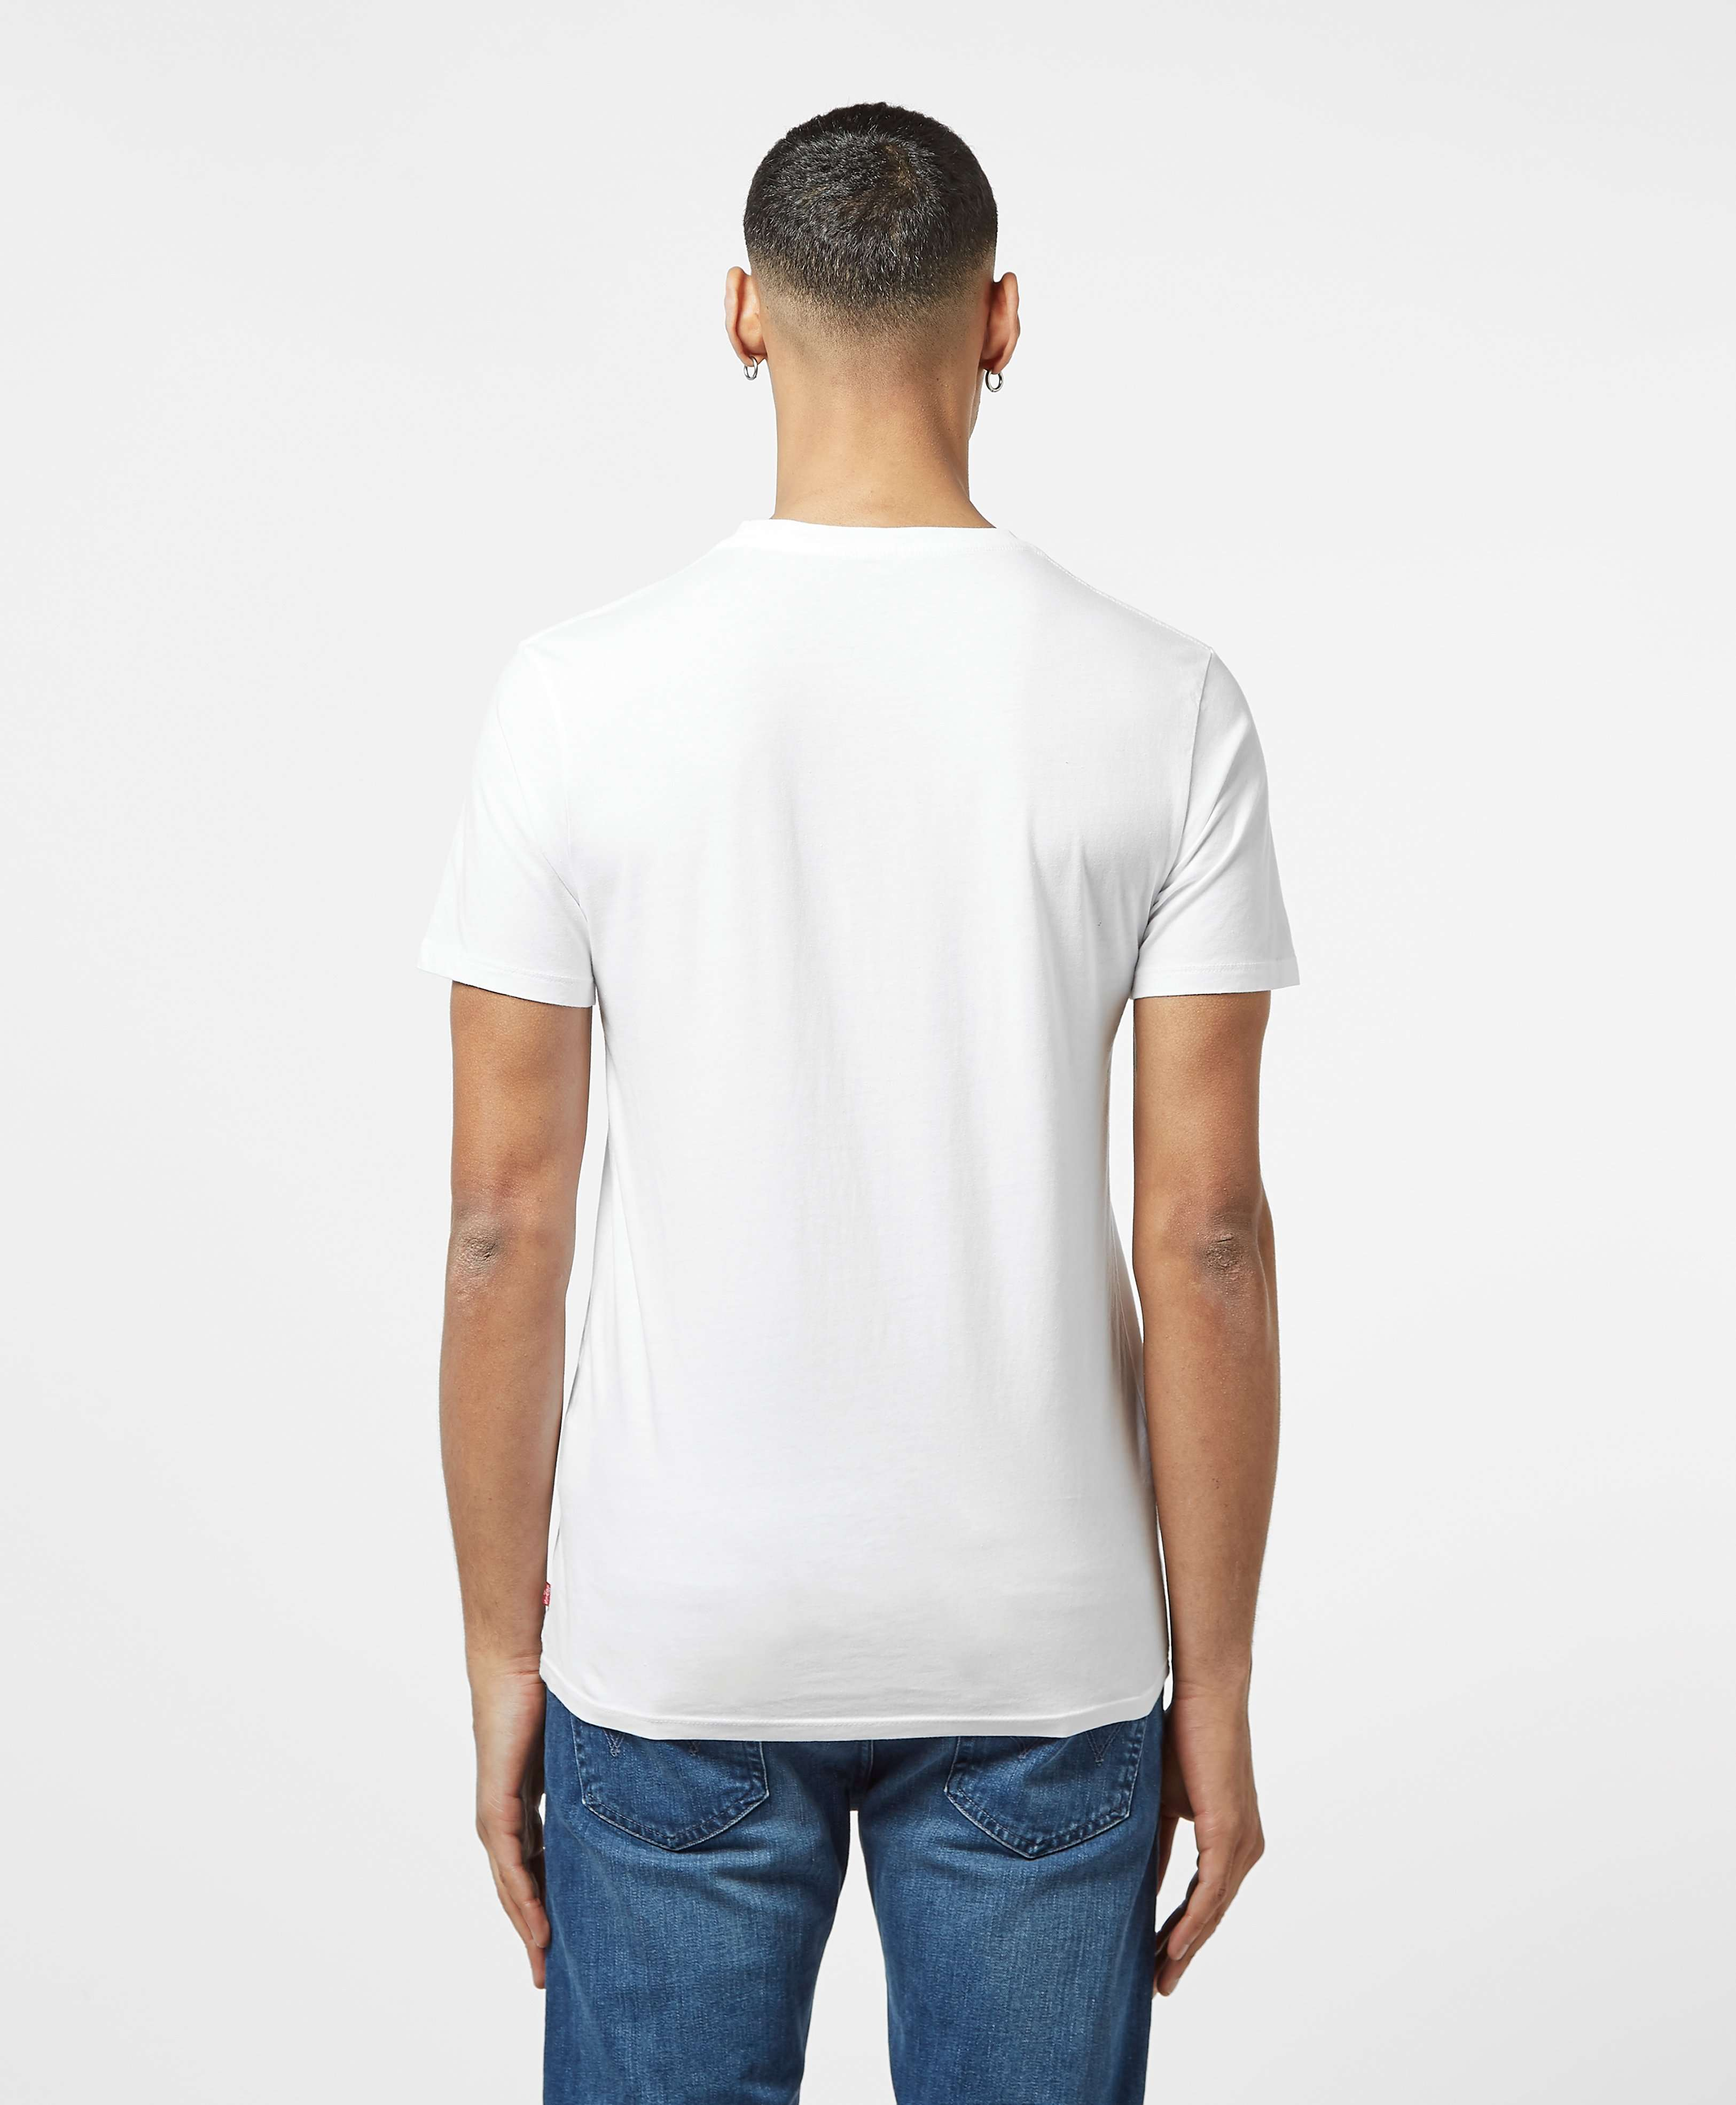 Levis Pool Logo Short Sleeve T-Shirt - Online Exclusive